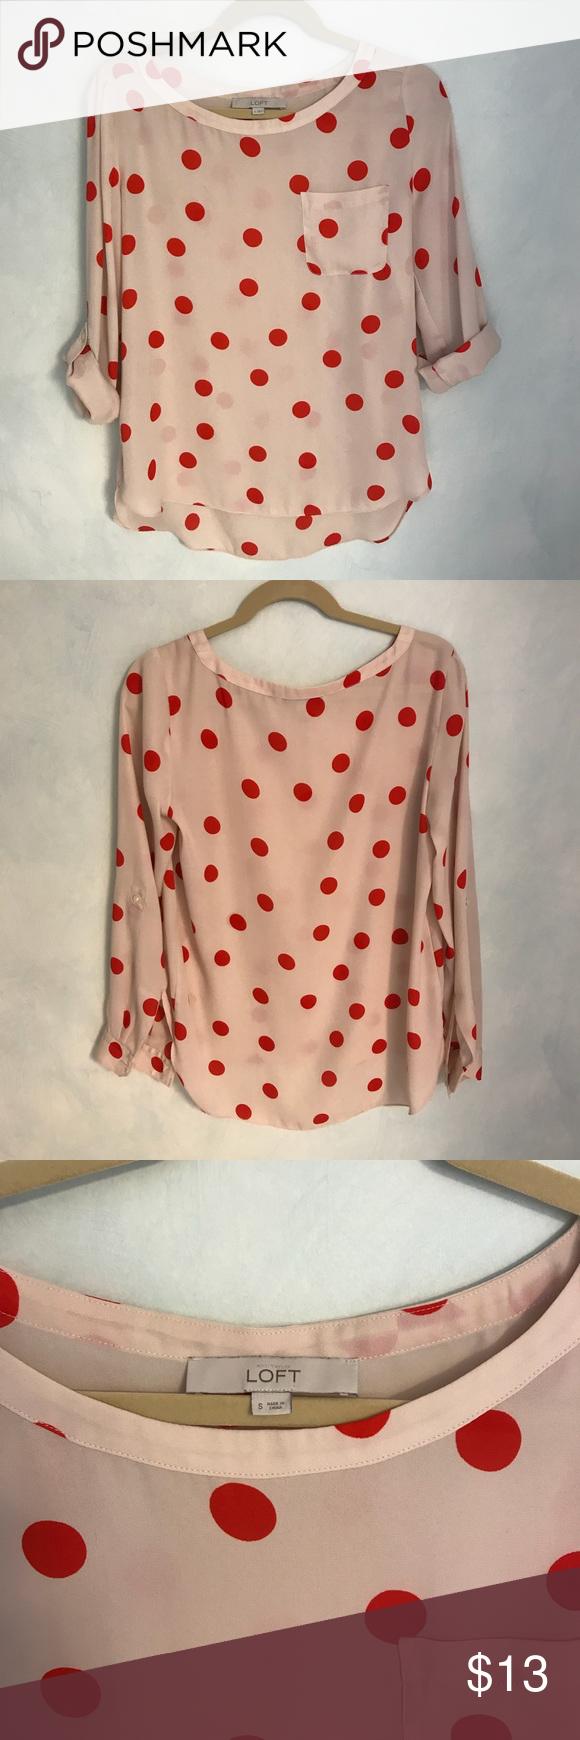 Loft polka dot blouse my posh picks pinterest lofts